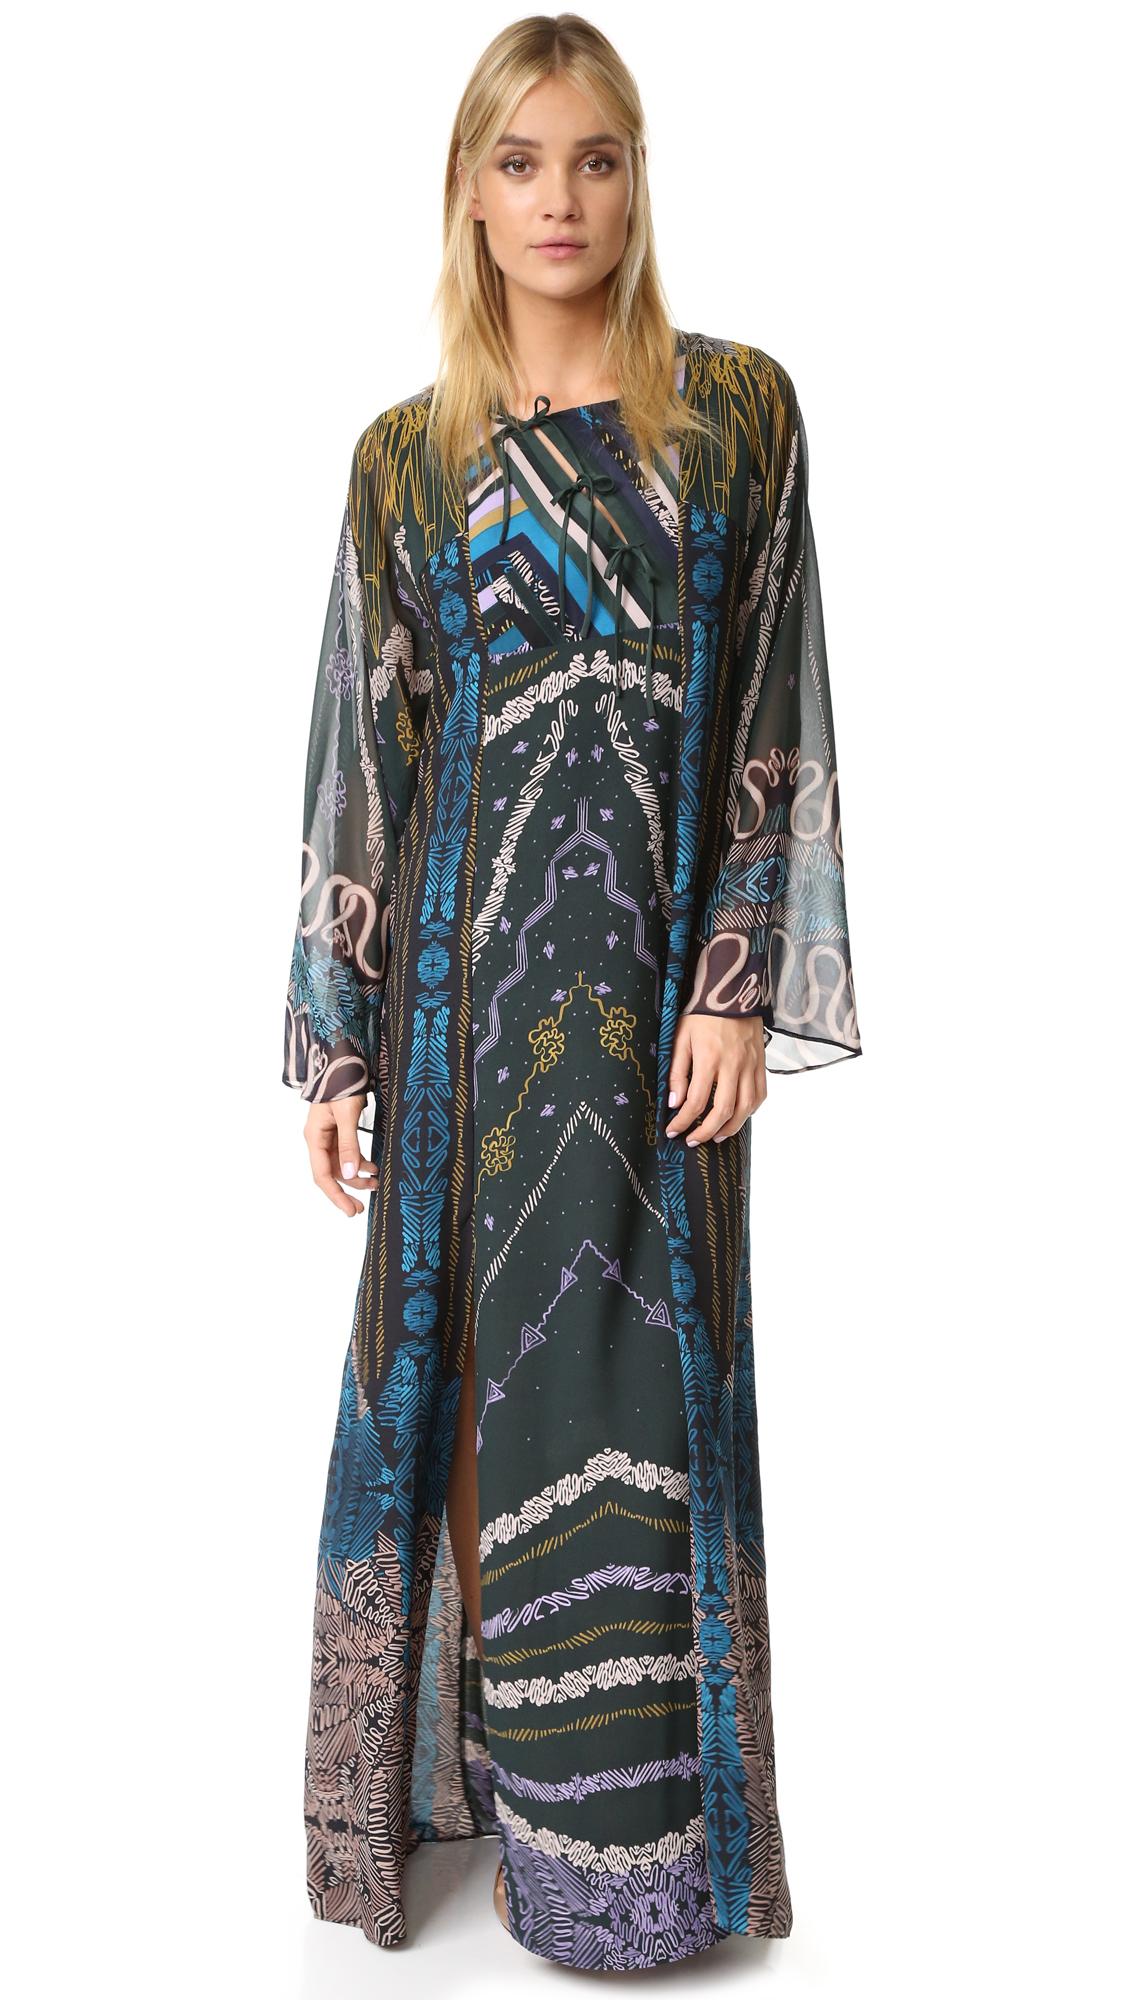 Bcbgmaxazria Finolla Dress - Pine Combo at Shopbop